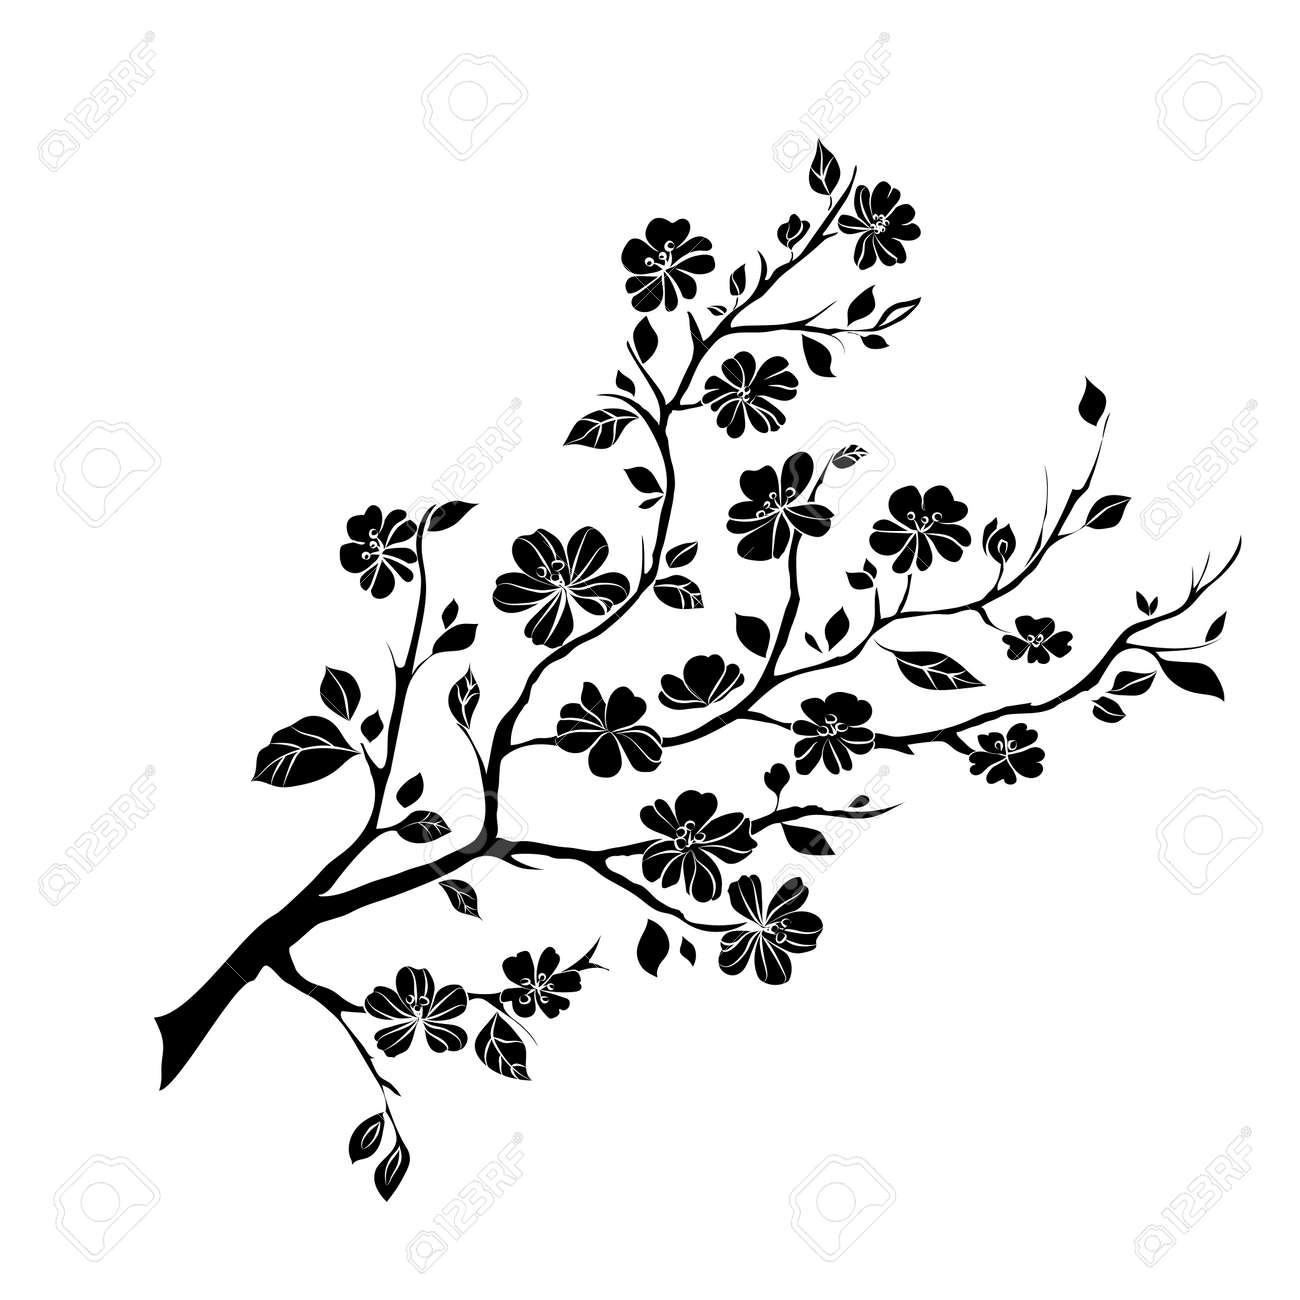 twig sakura blossoms. Vector illustration. Black Silhouette - 41794584